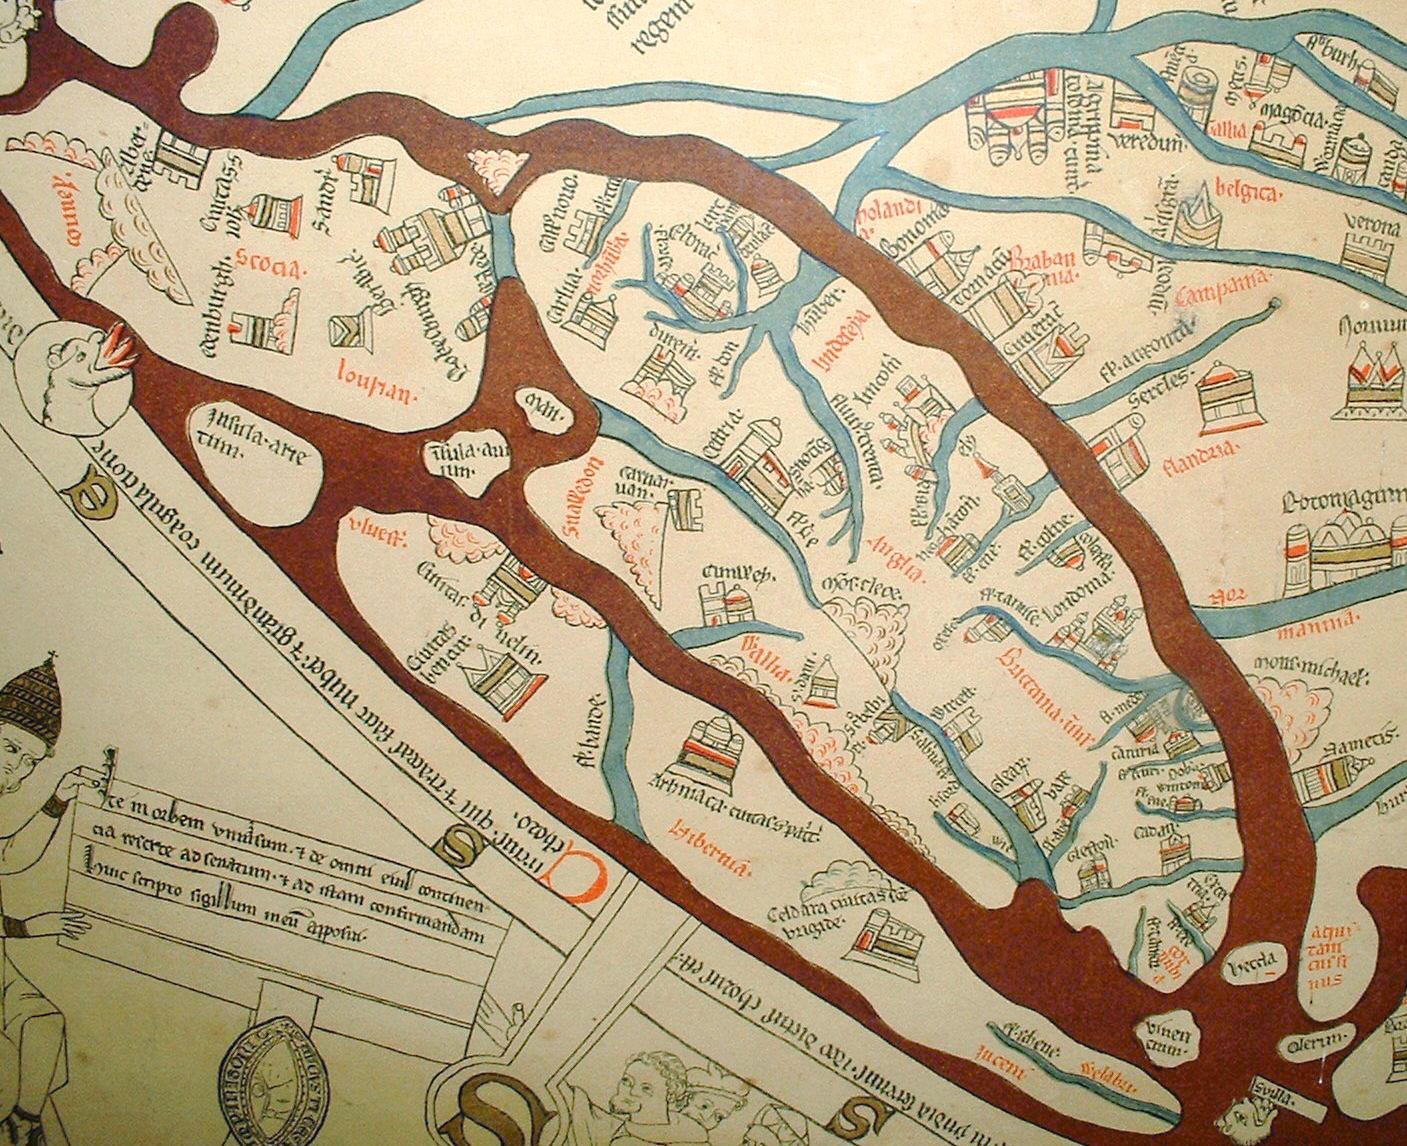 Hereford Mappa Mundi detail Britainedit